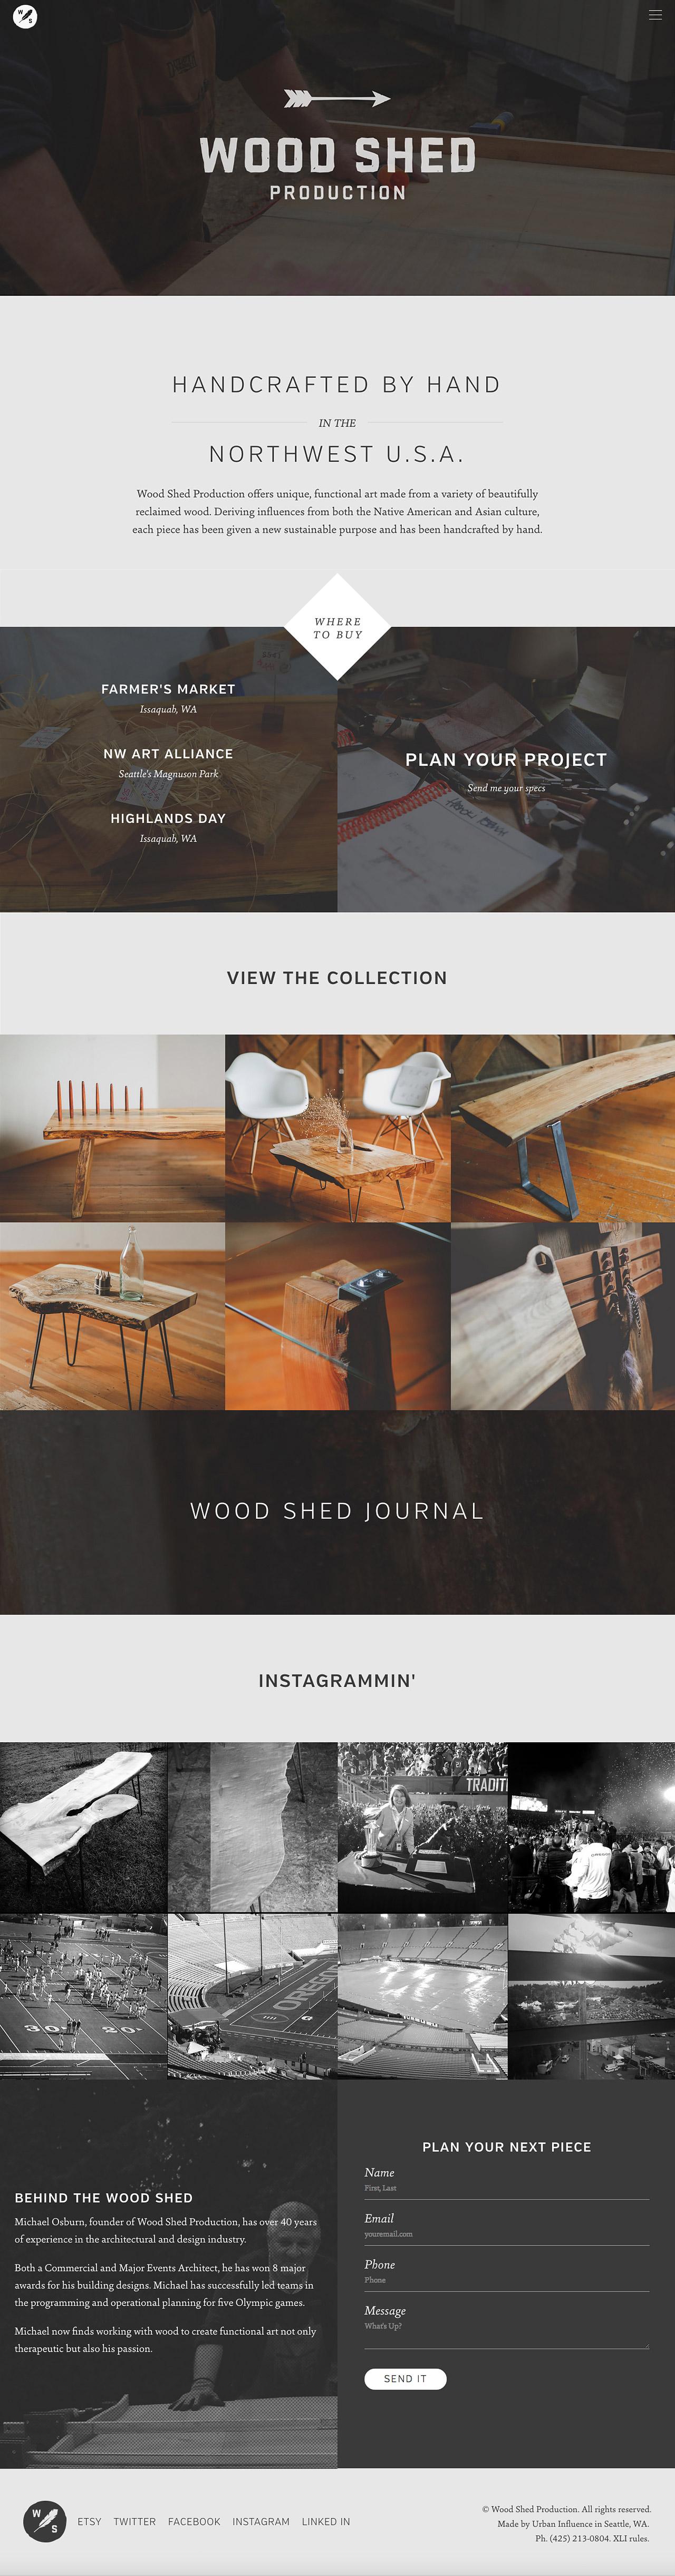 Wood Shed Production Website Screenshot